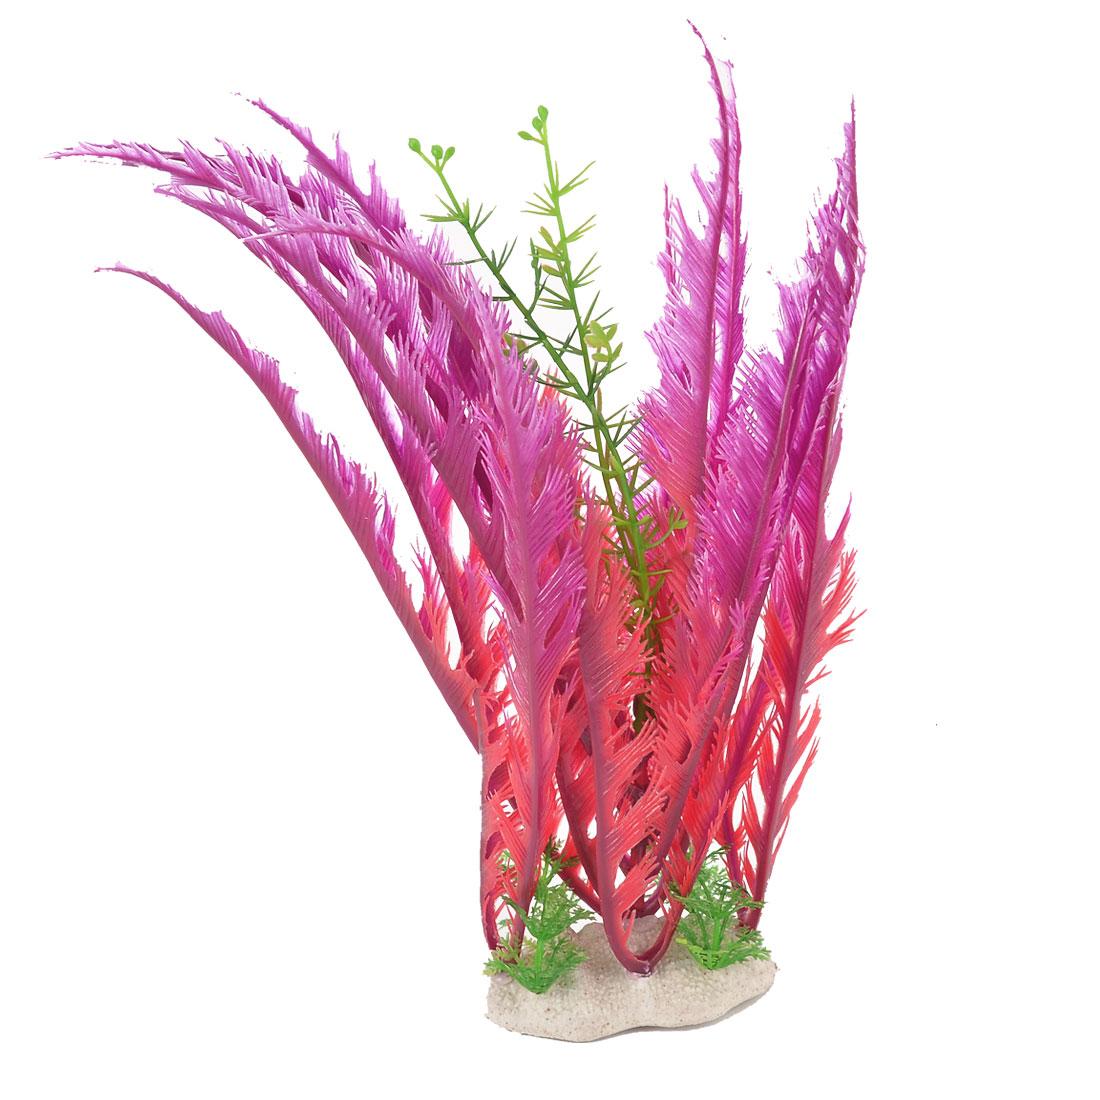 Aquarium Ceramic Base Plastic Artificial Aquascaping Water Weeds Plant Grass Flower 30cm Height